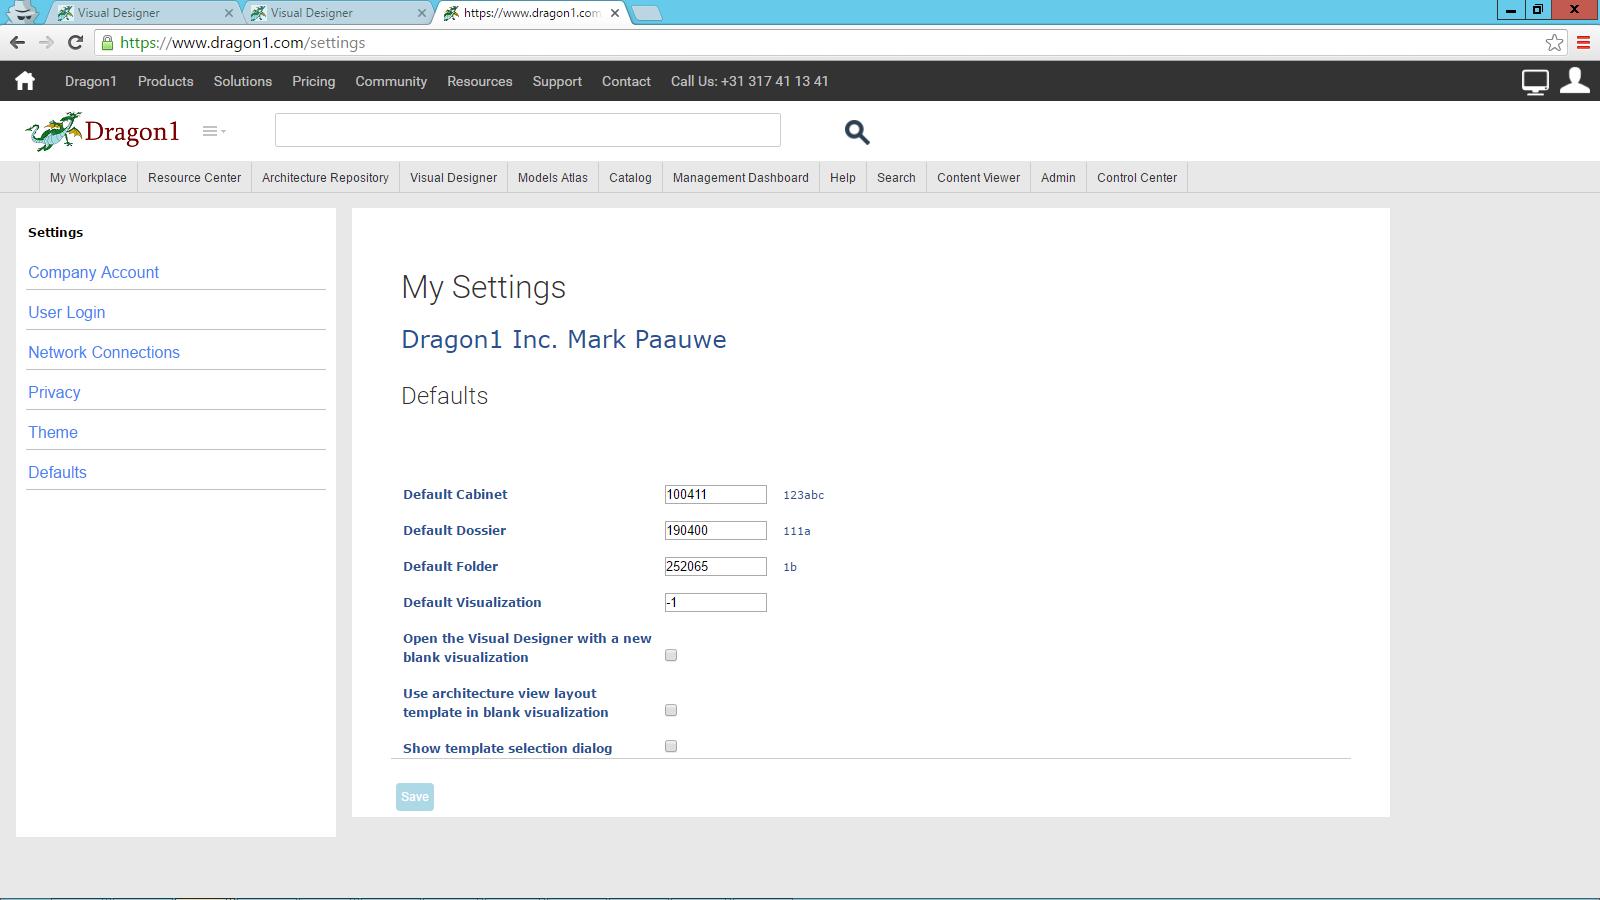 dragon1 defaults settings